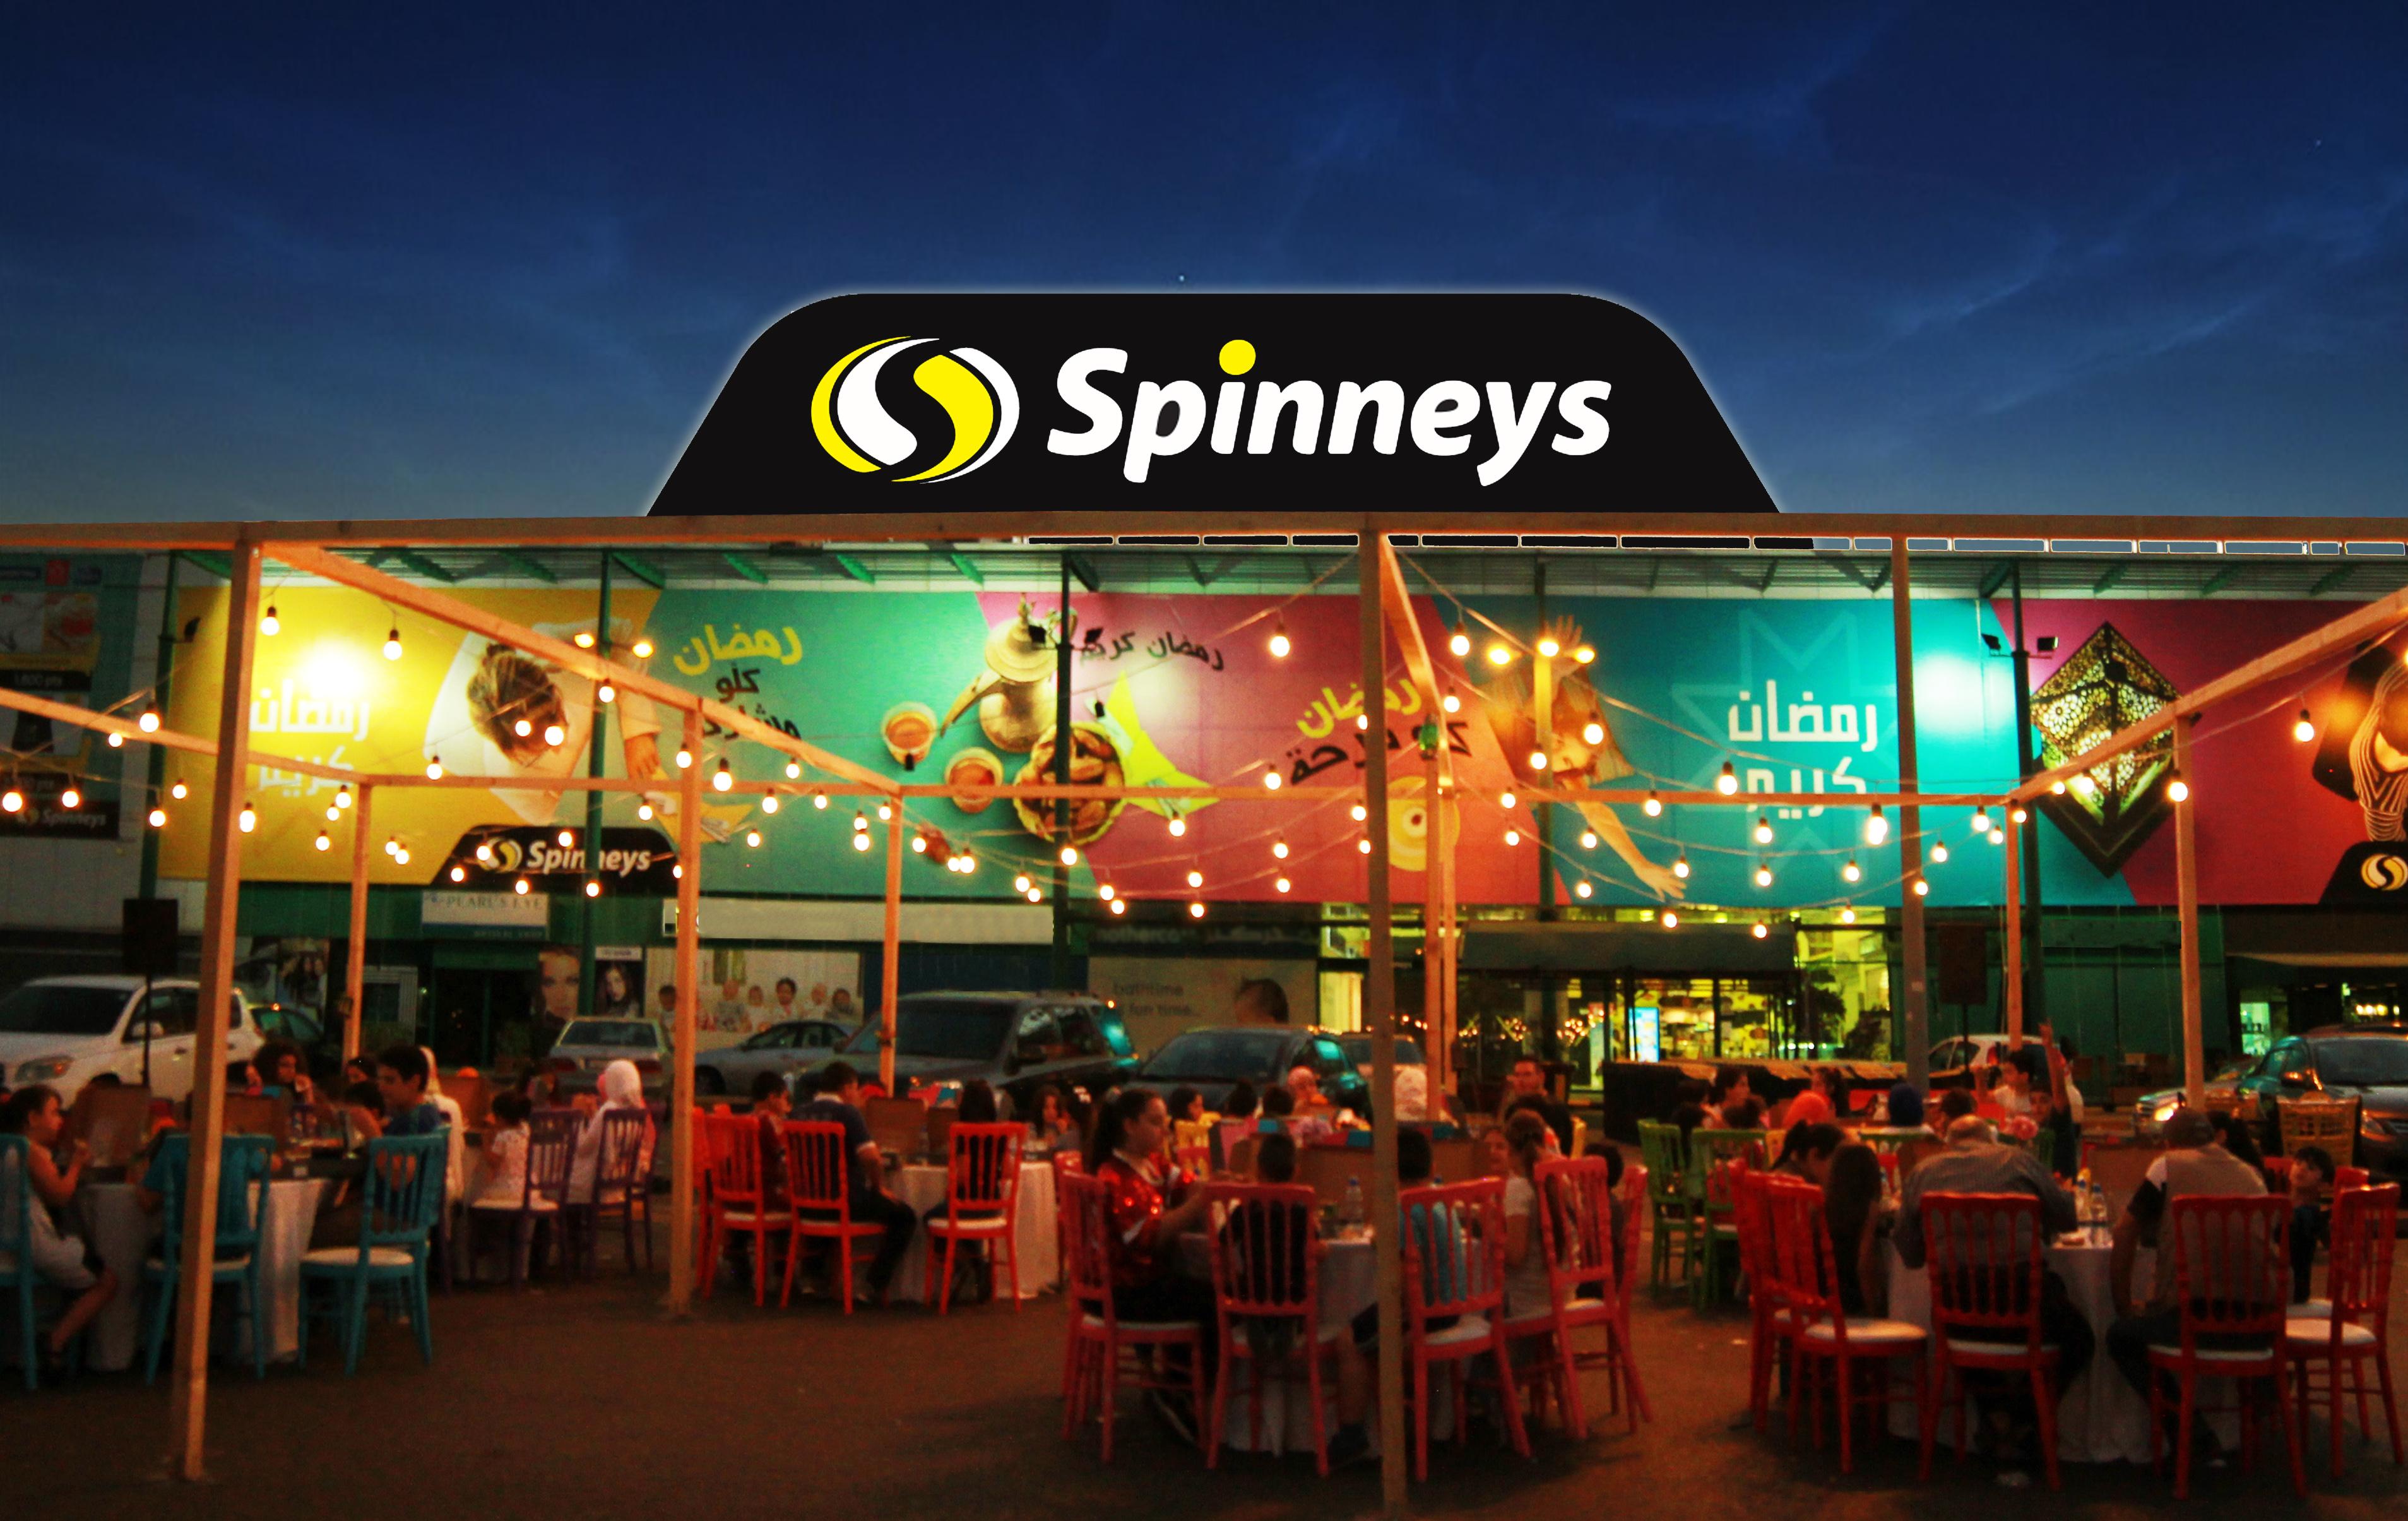 Spinneys Ajialouna Iftar